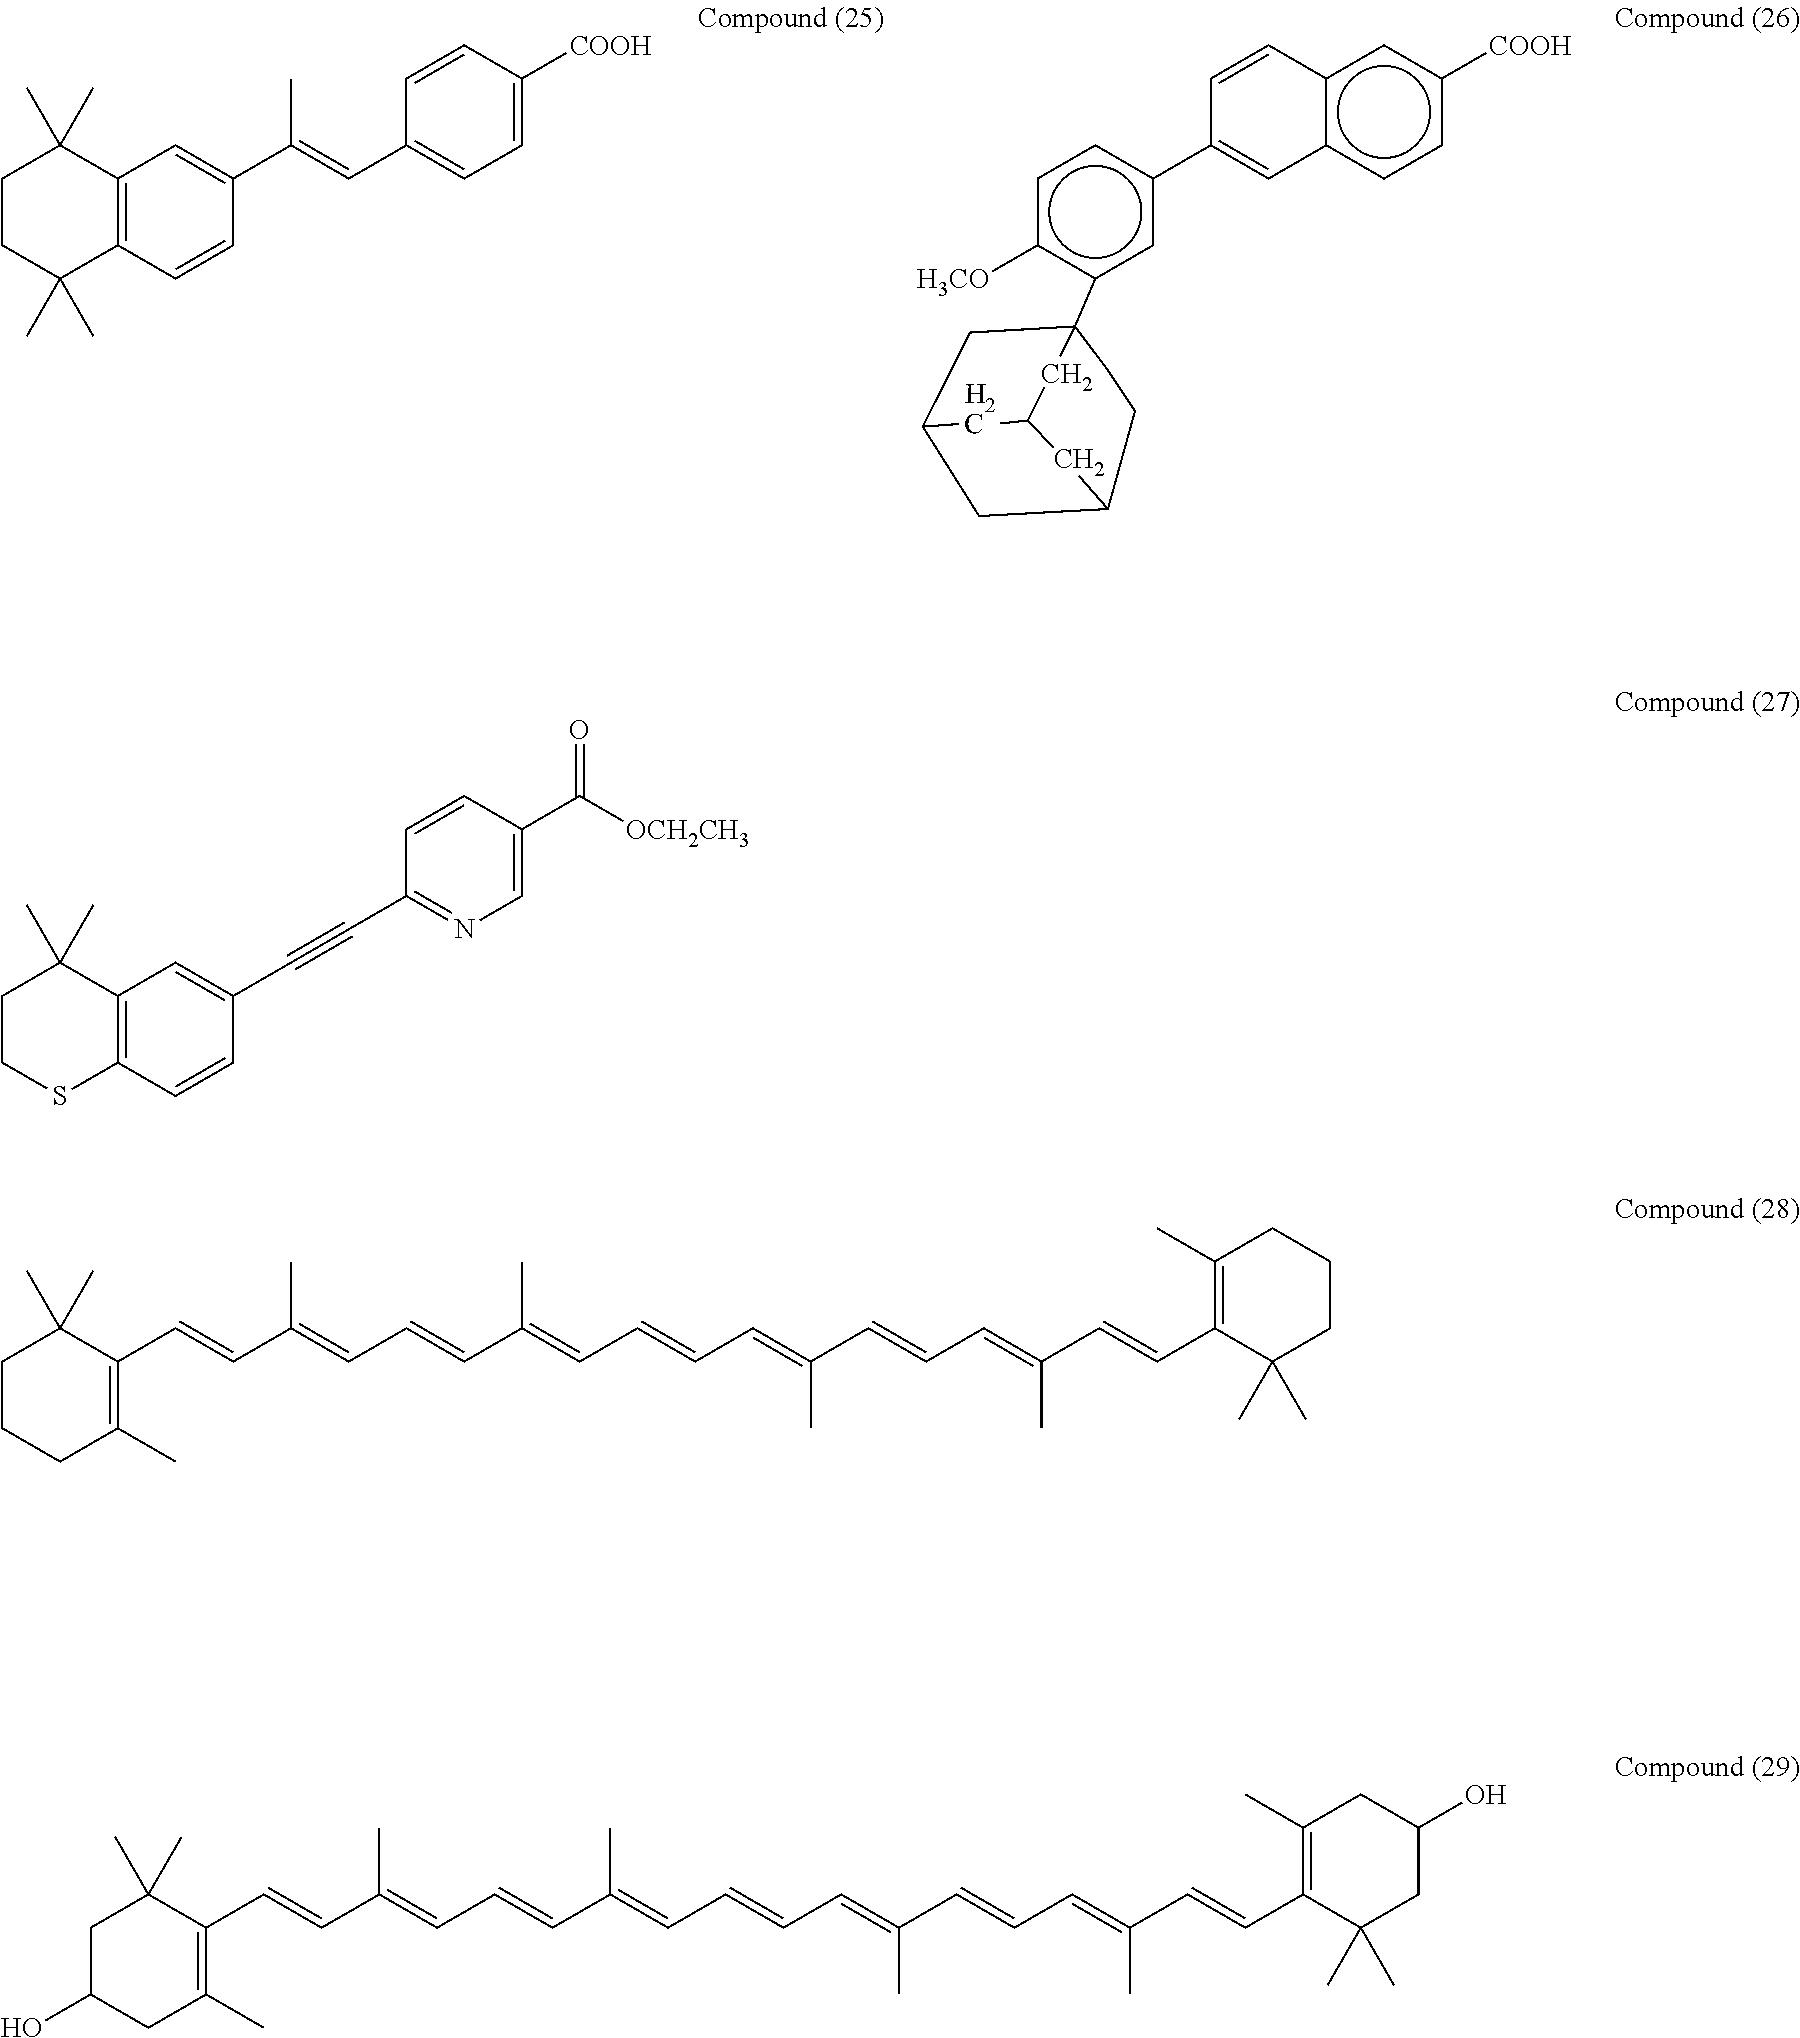 Patent US 8,486,374 B2